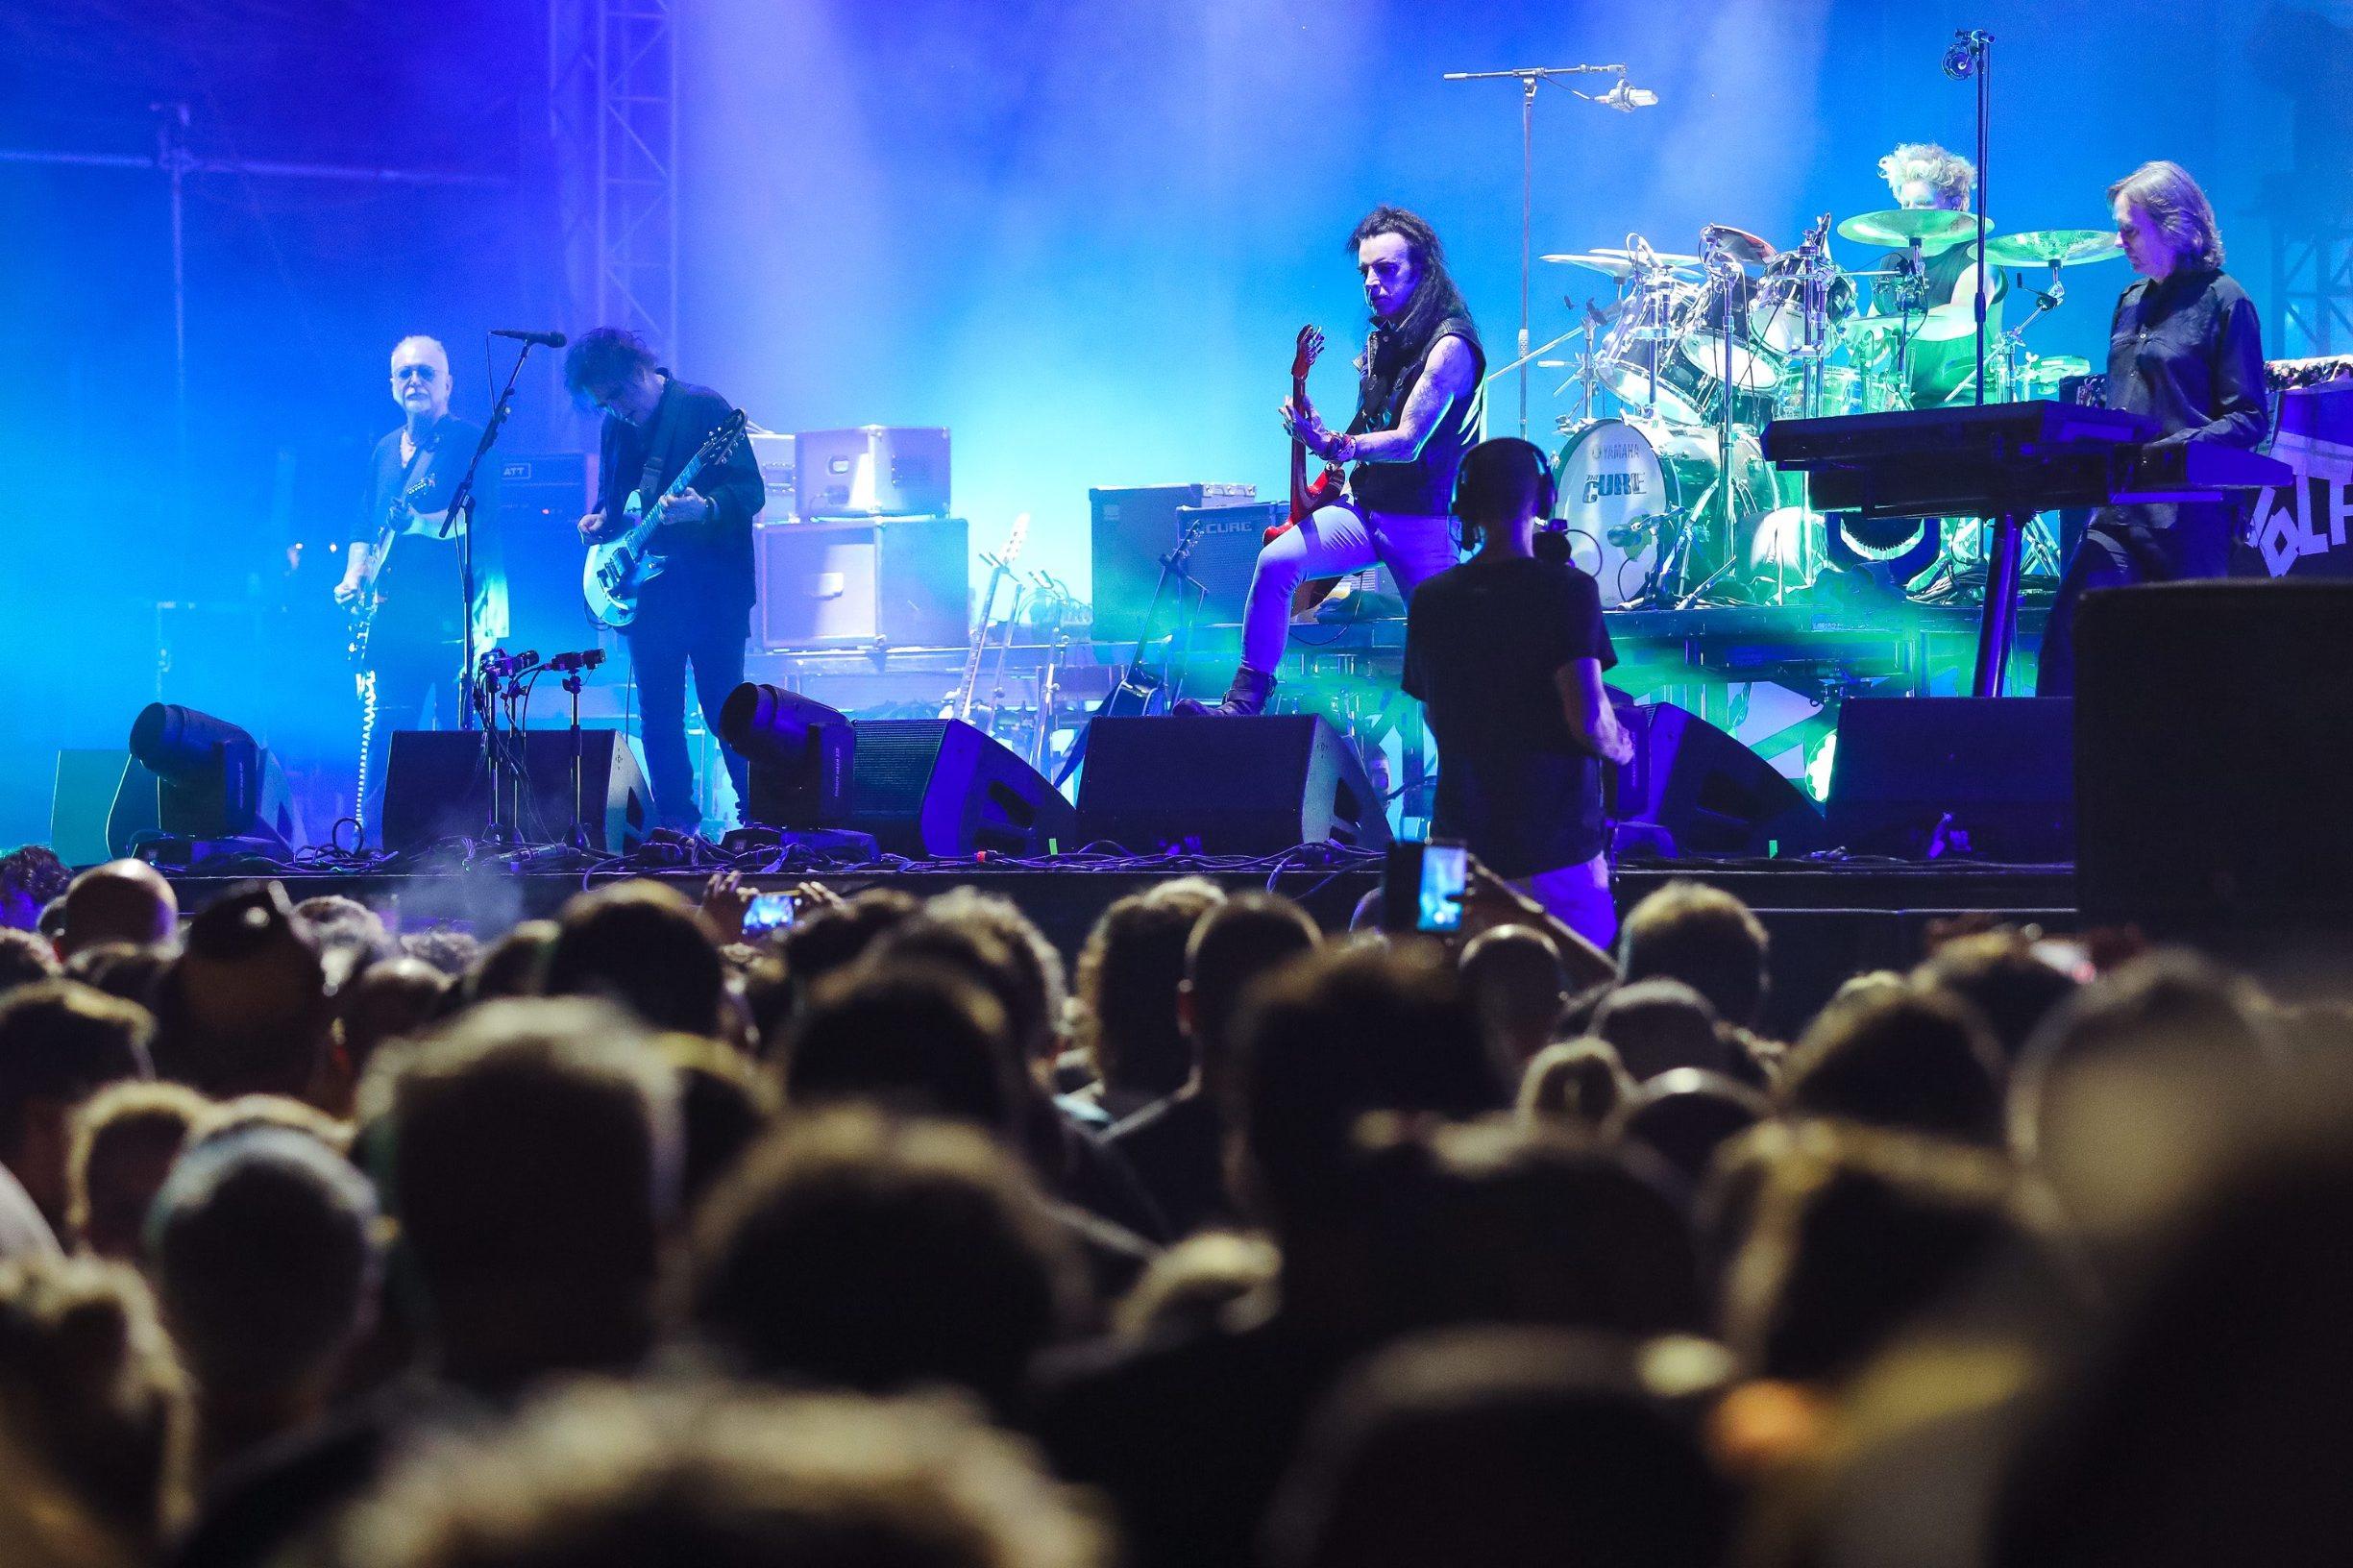 Nastup grupe The Cure na festivalu INmusic